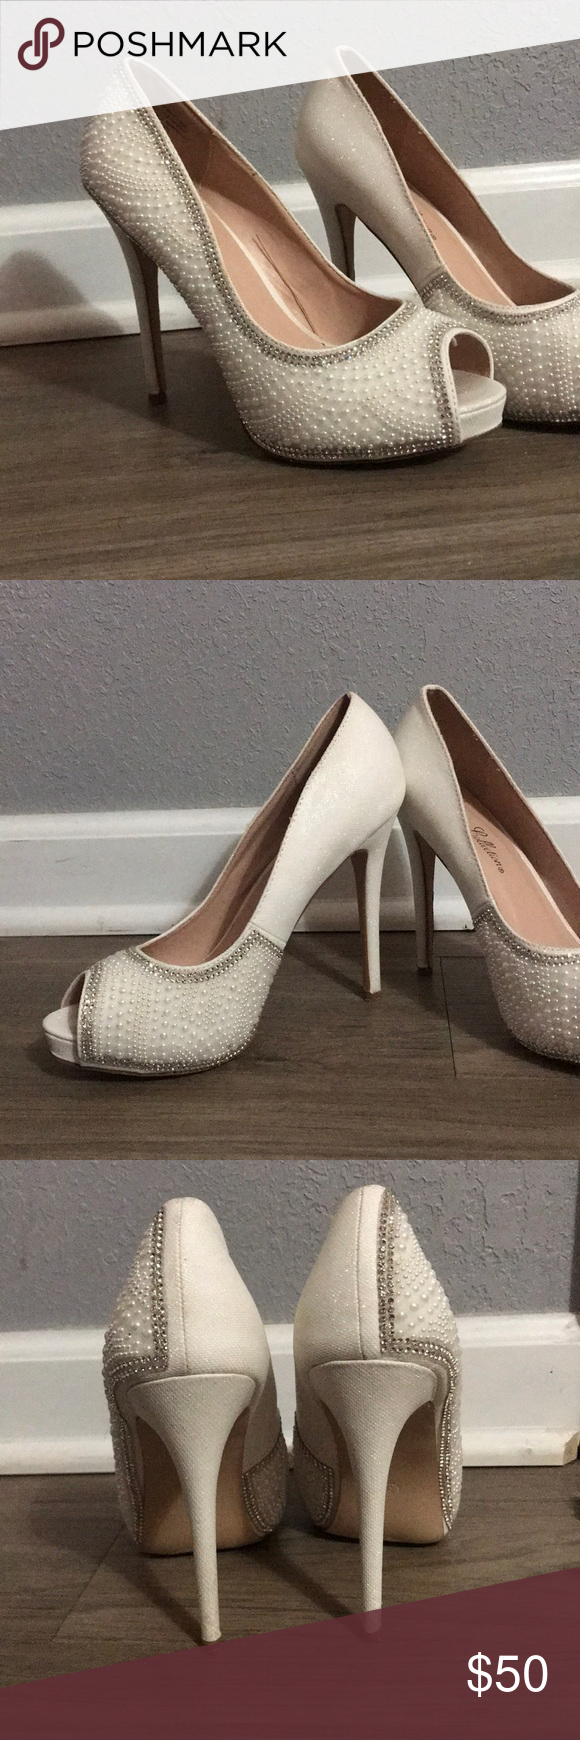 dd02a9bcb99 Bridal   Prom pearl and rhinestone heels De Blossom Collection Pearl    Rhinestone Heels Worn Once